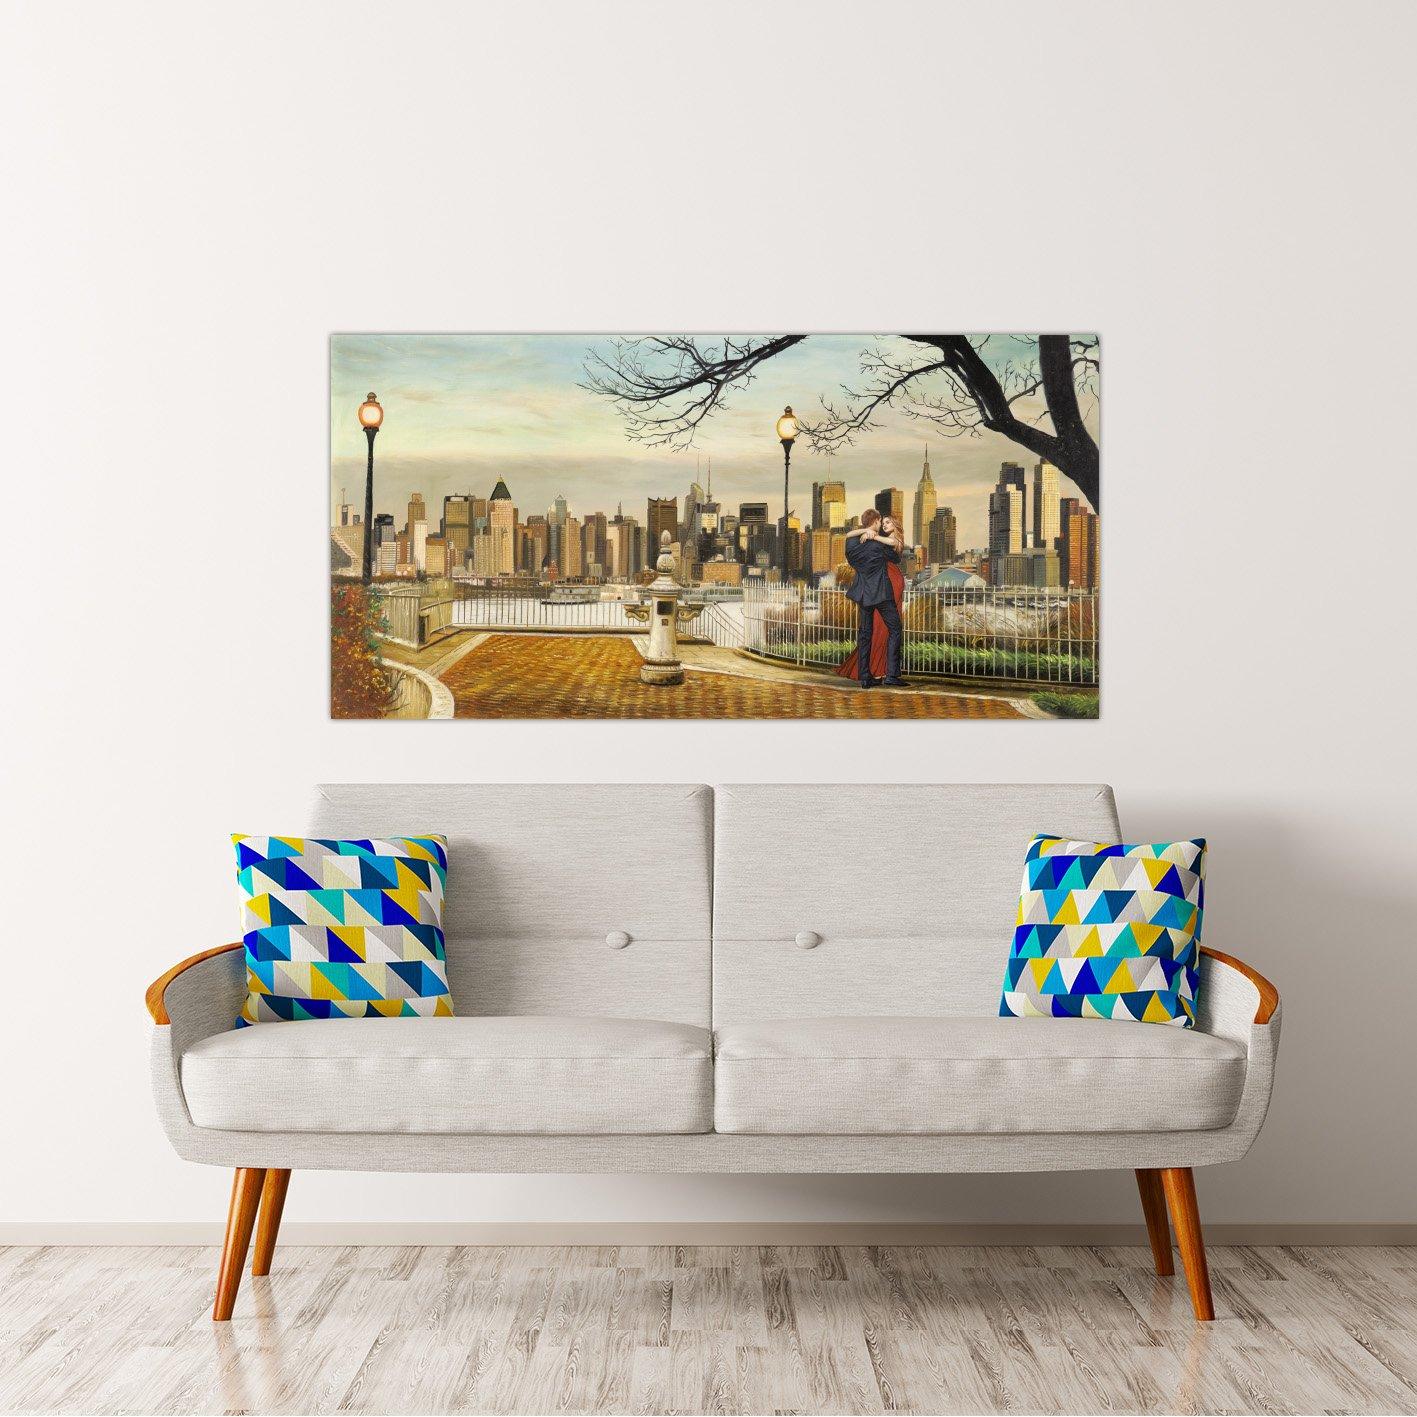 Rahmen Druck auf Leinwand Leinwand Leinwand mit Rahmen in Holz Pierre Benson Lovers in New York 160x80 CM B07BNLTN9L   Elegantes Aussehen  35ad80